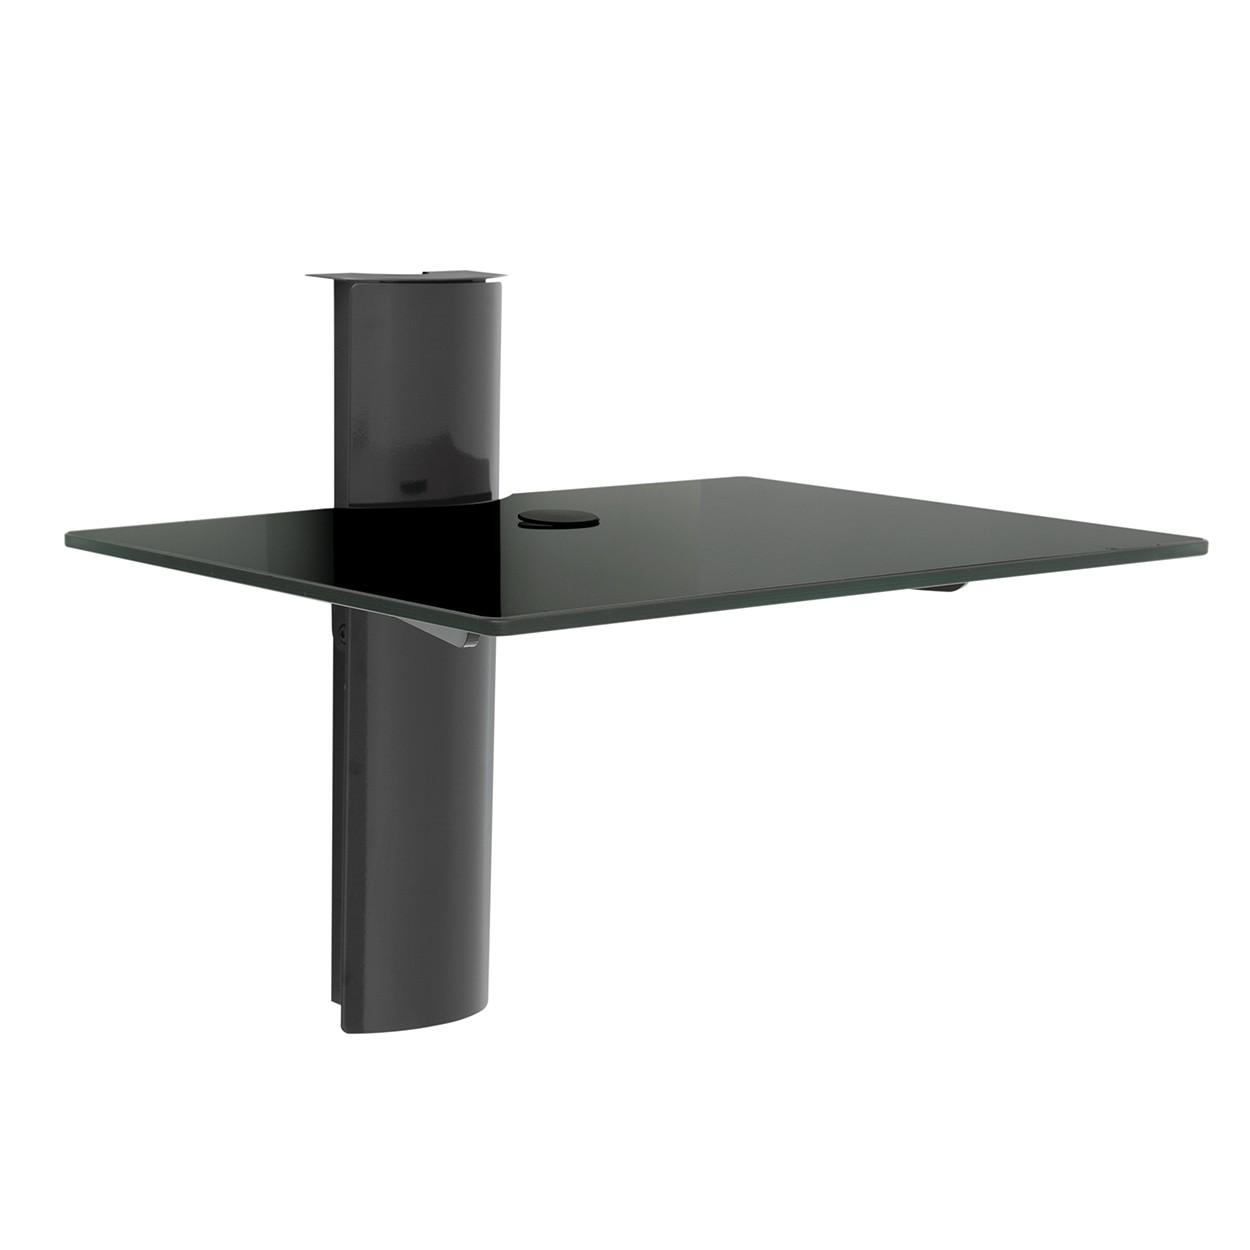 RACK SIMPLY 45/1 C BLACK GLASS BLACK